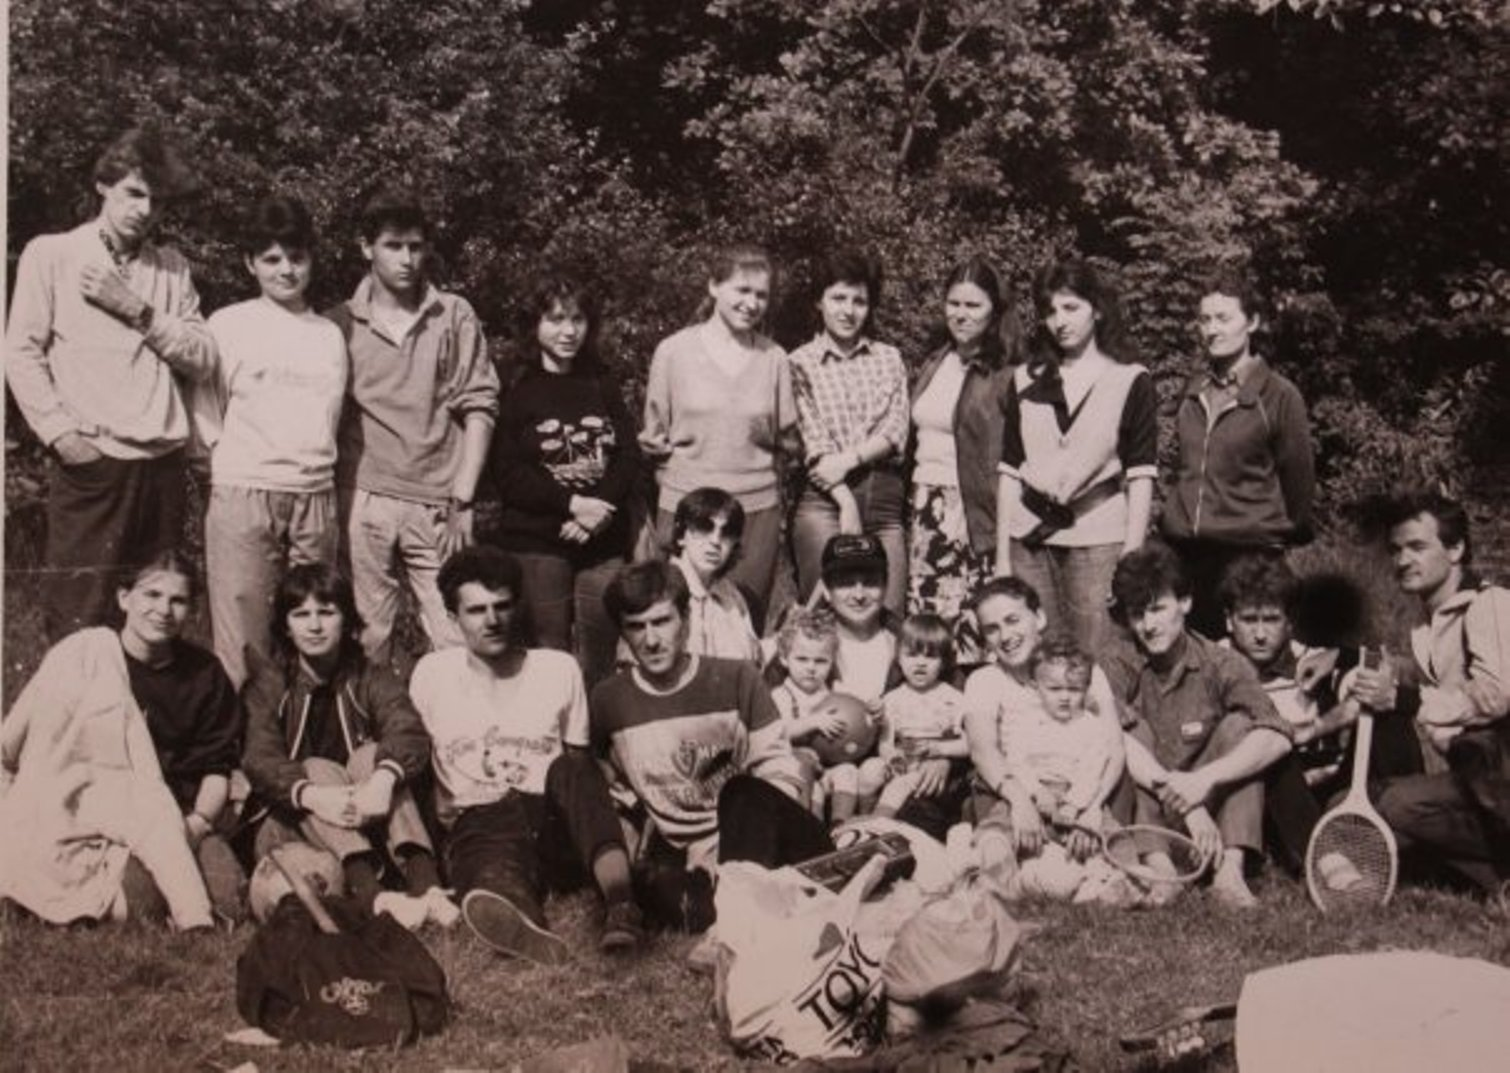 TINERI CREDINCIOSI DIN BISERICA CRESTINA DUPA EVANGHELIE DRAGOS VODA LA PADURE IN 1988